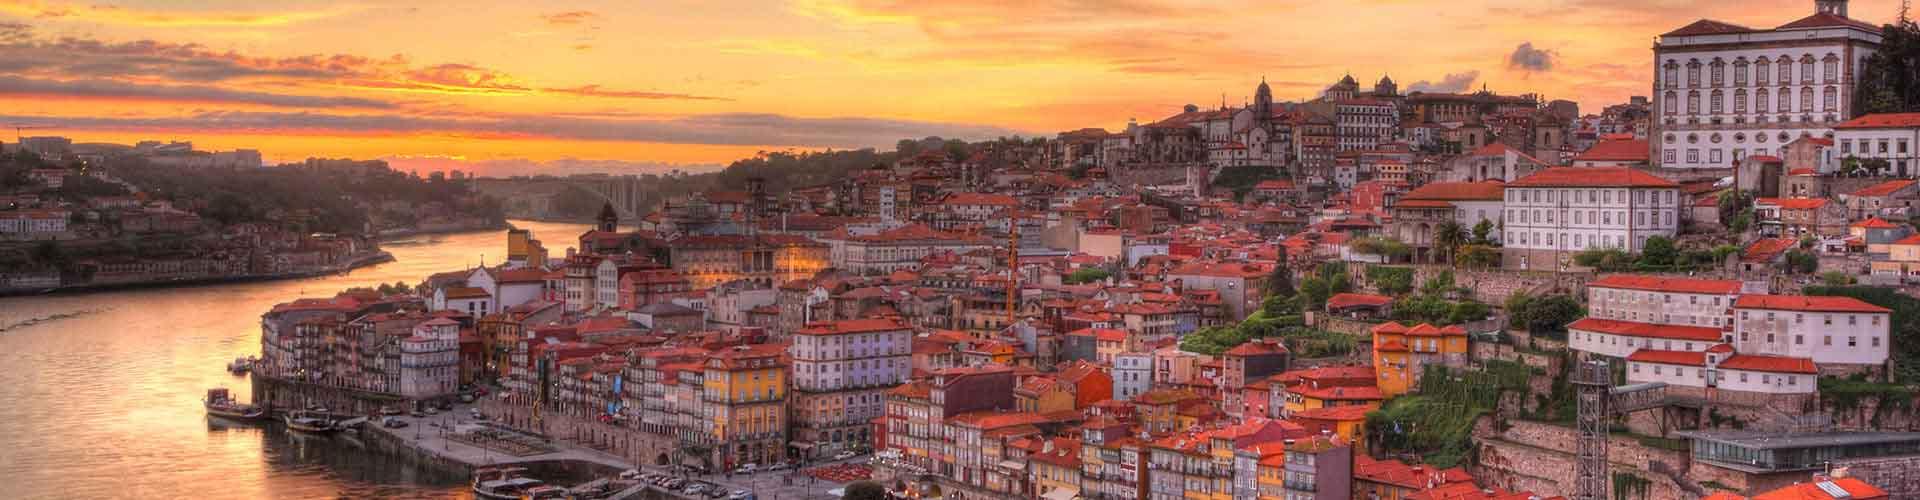 Porto - Hostelů v Porto. Mapy pro Porto, fotky a recenze pro každý hostel v Porto.